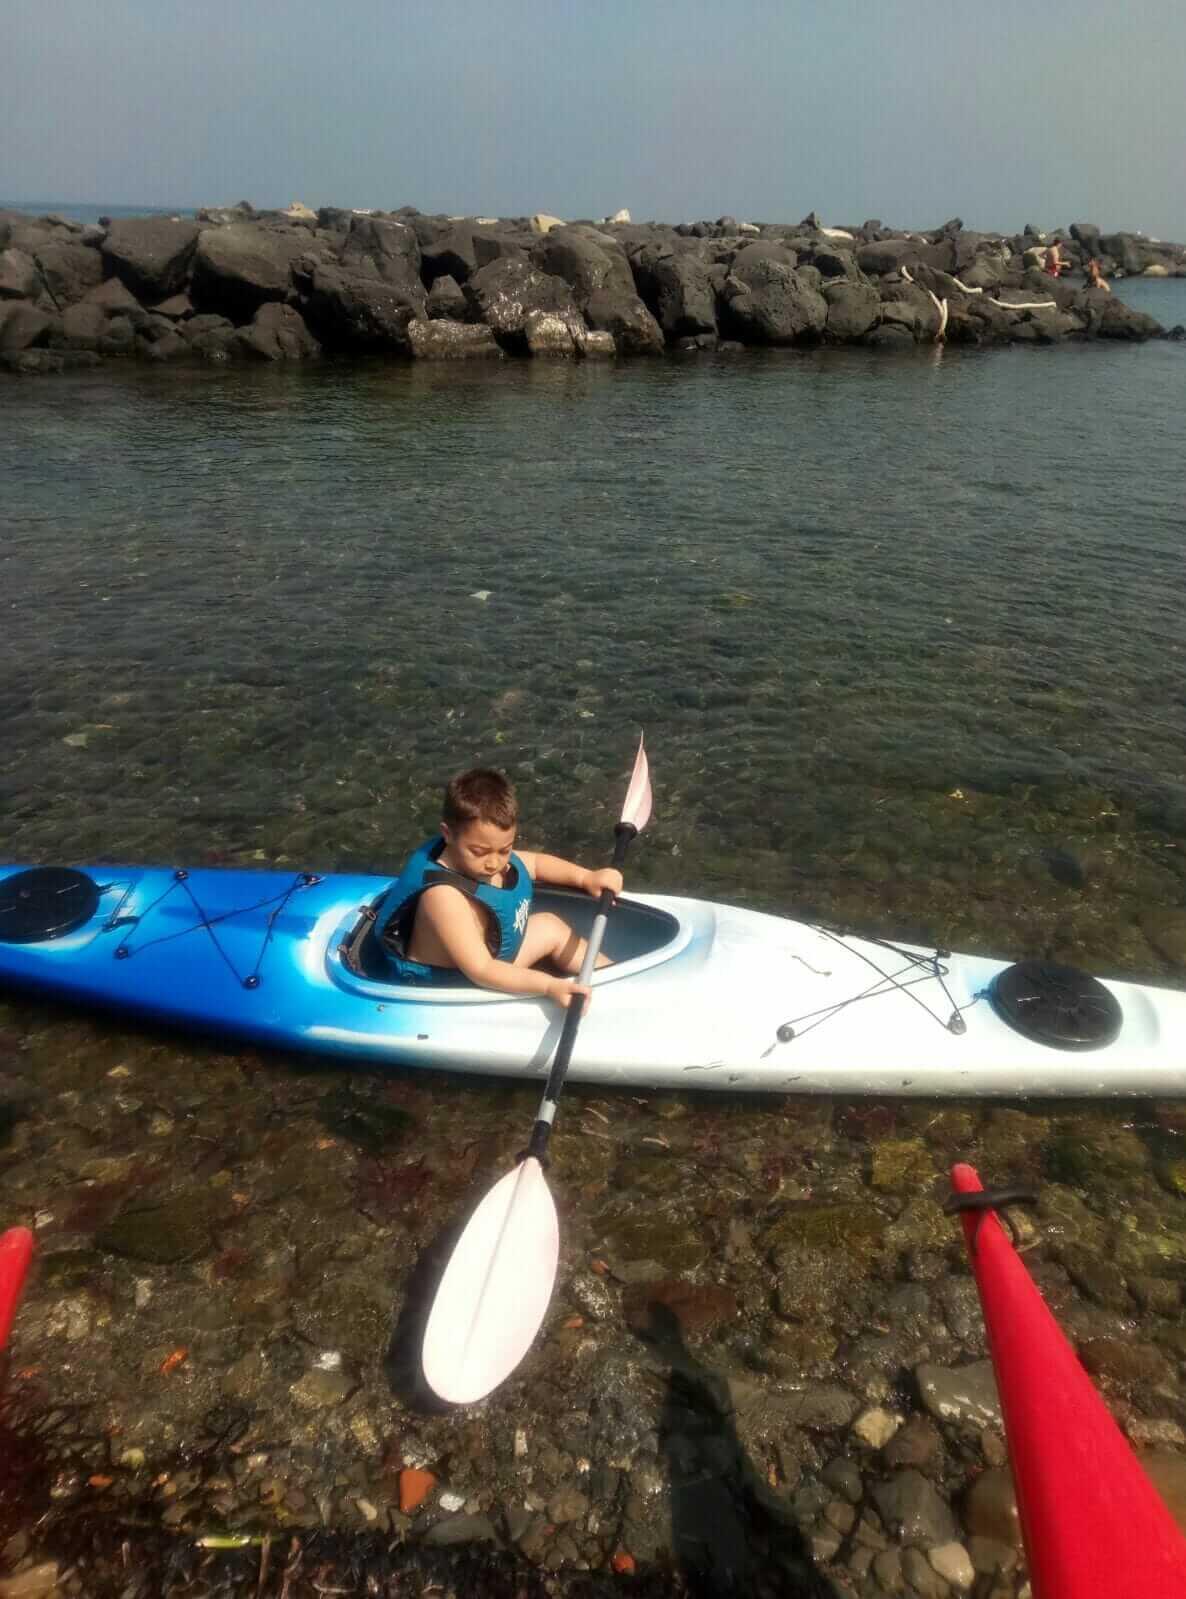 massa lubrense, sorrento, amalfi, mare, sea, kayak